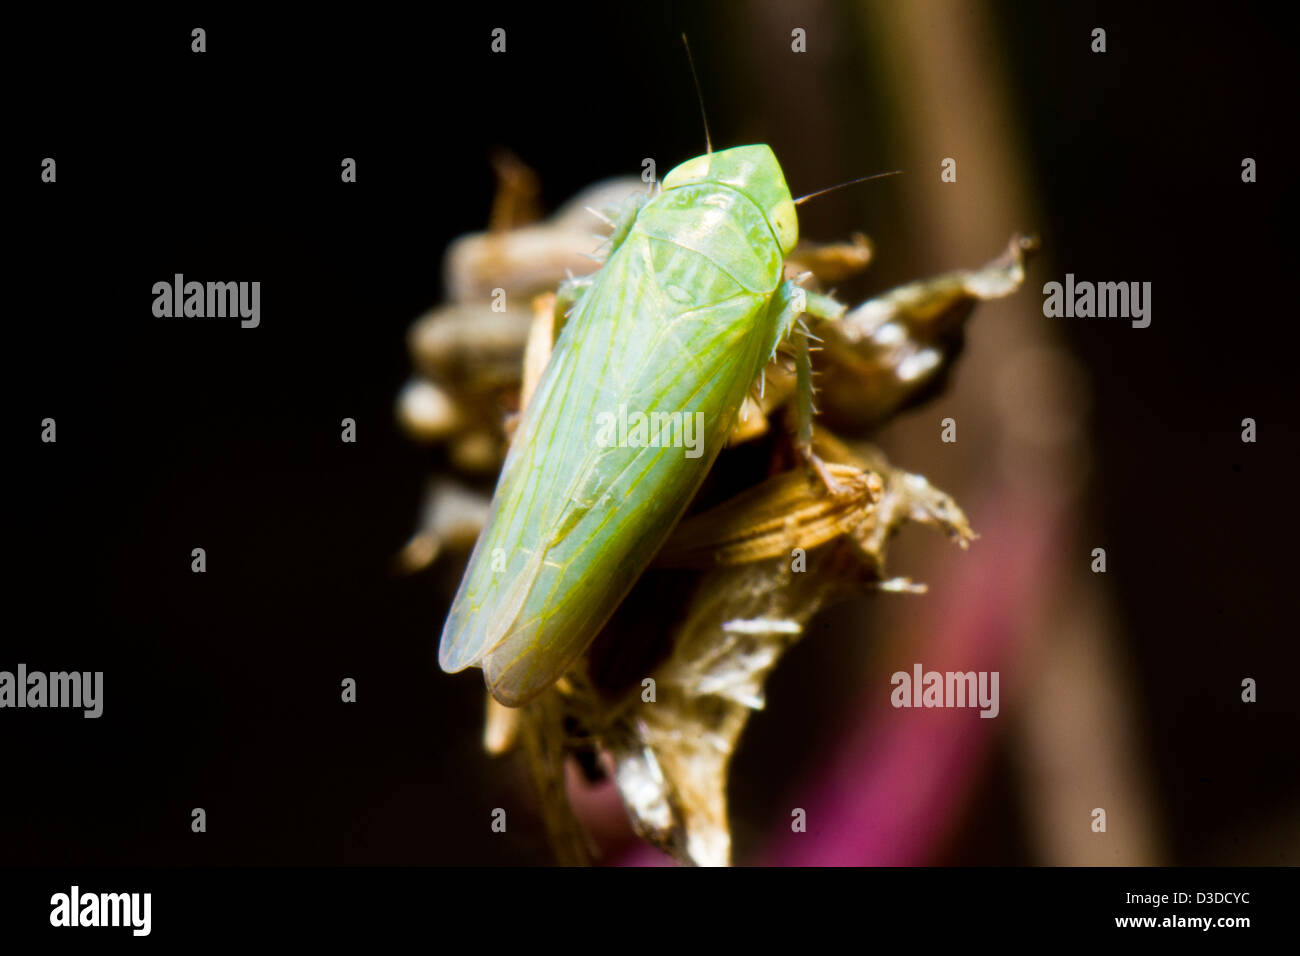 Close up view of a tiny green leafhopper (Zygina nivea). - Stock Image